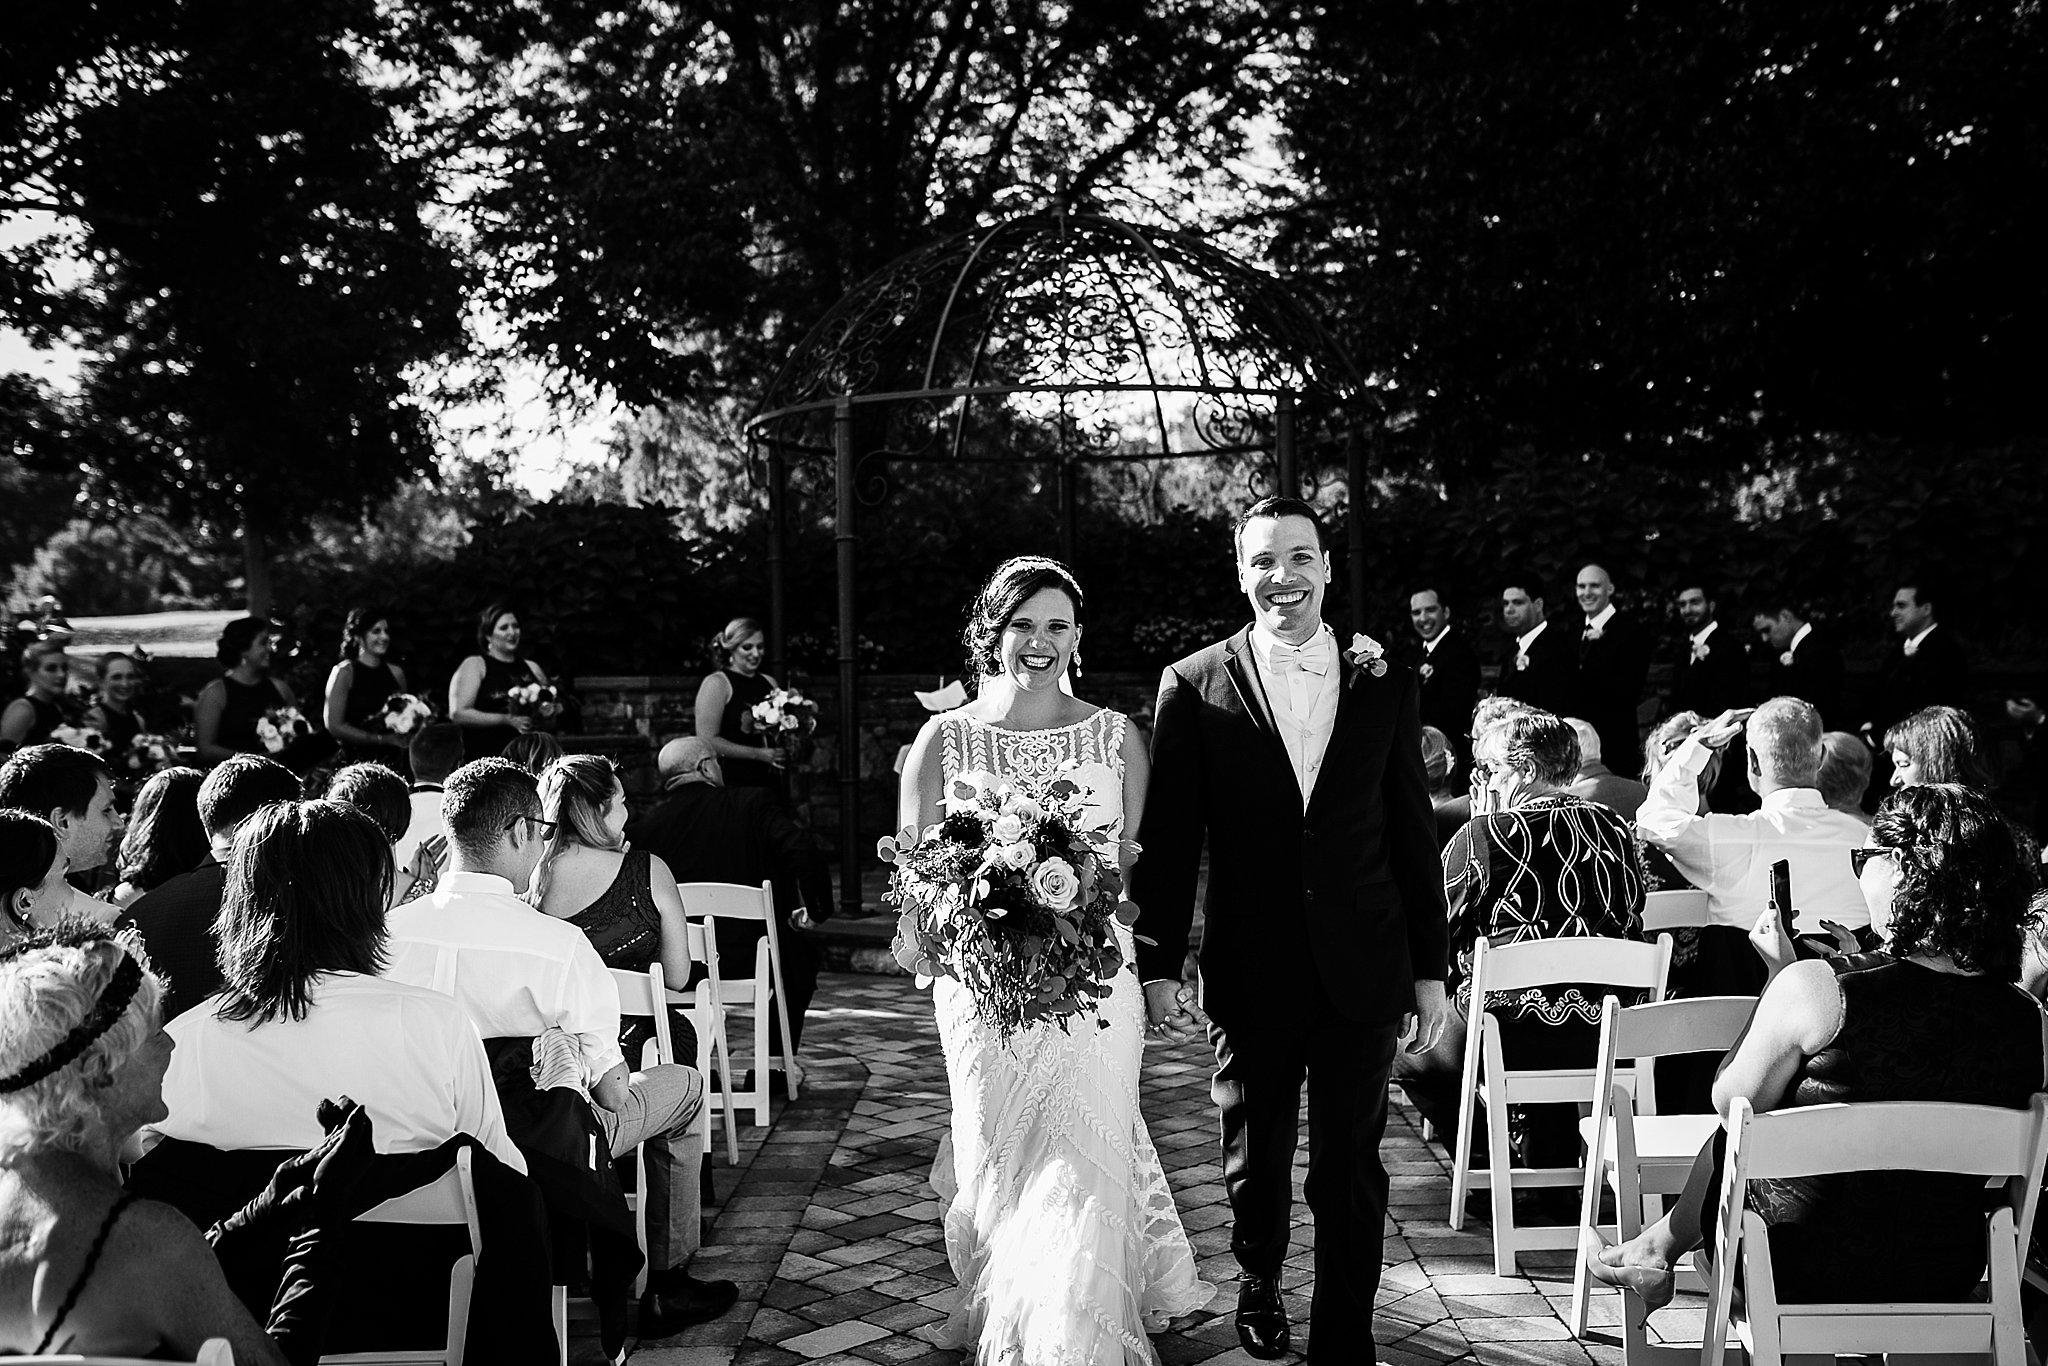 West Hills Country Club Wedding Gatsby Wedding Roaring Twenties Wedding Hudson Valley Wedding Photographer Sweet Alice Photography56.jpg